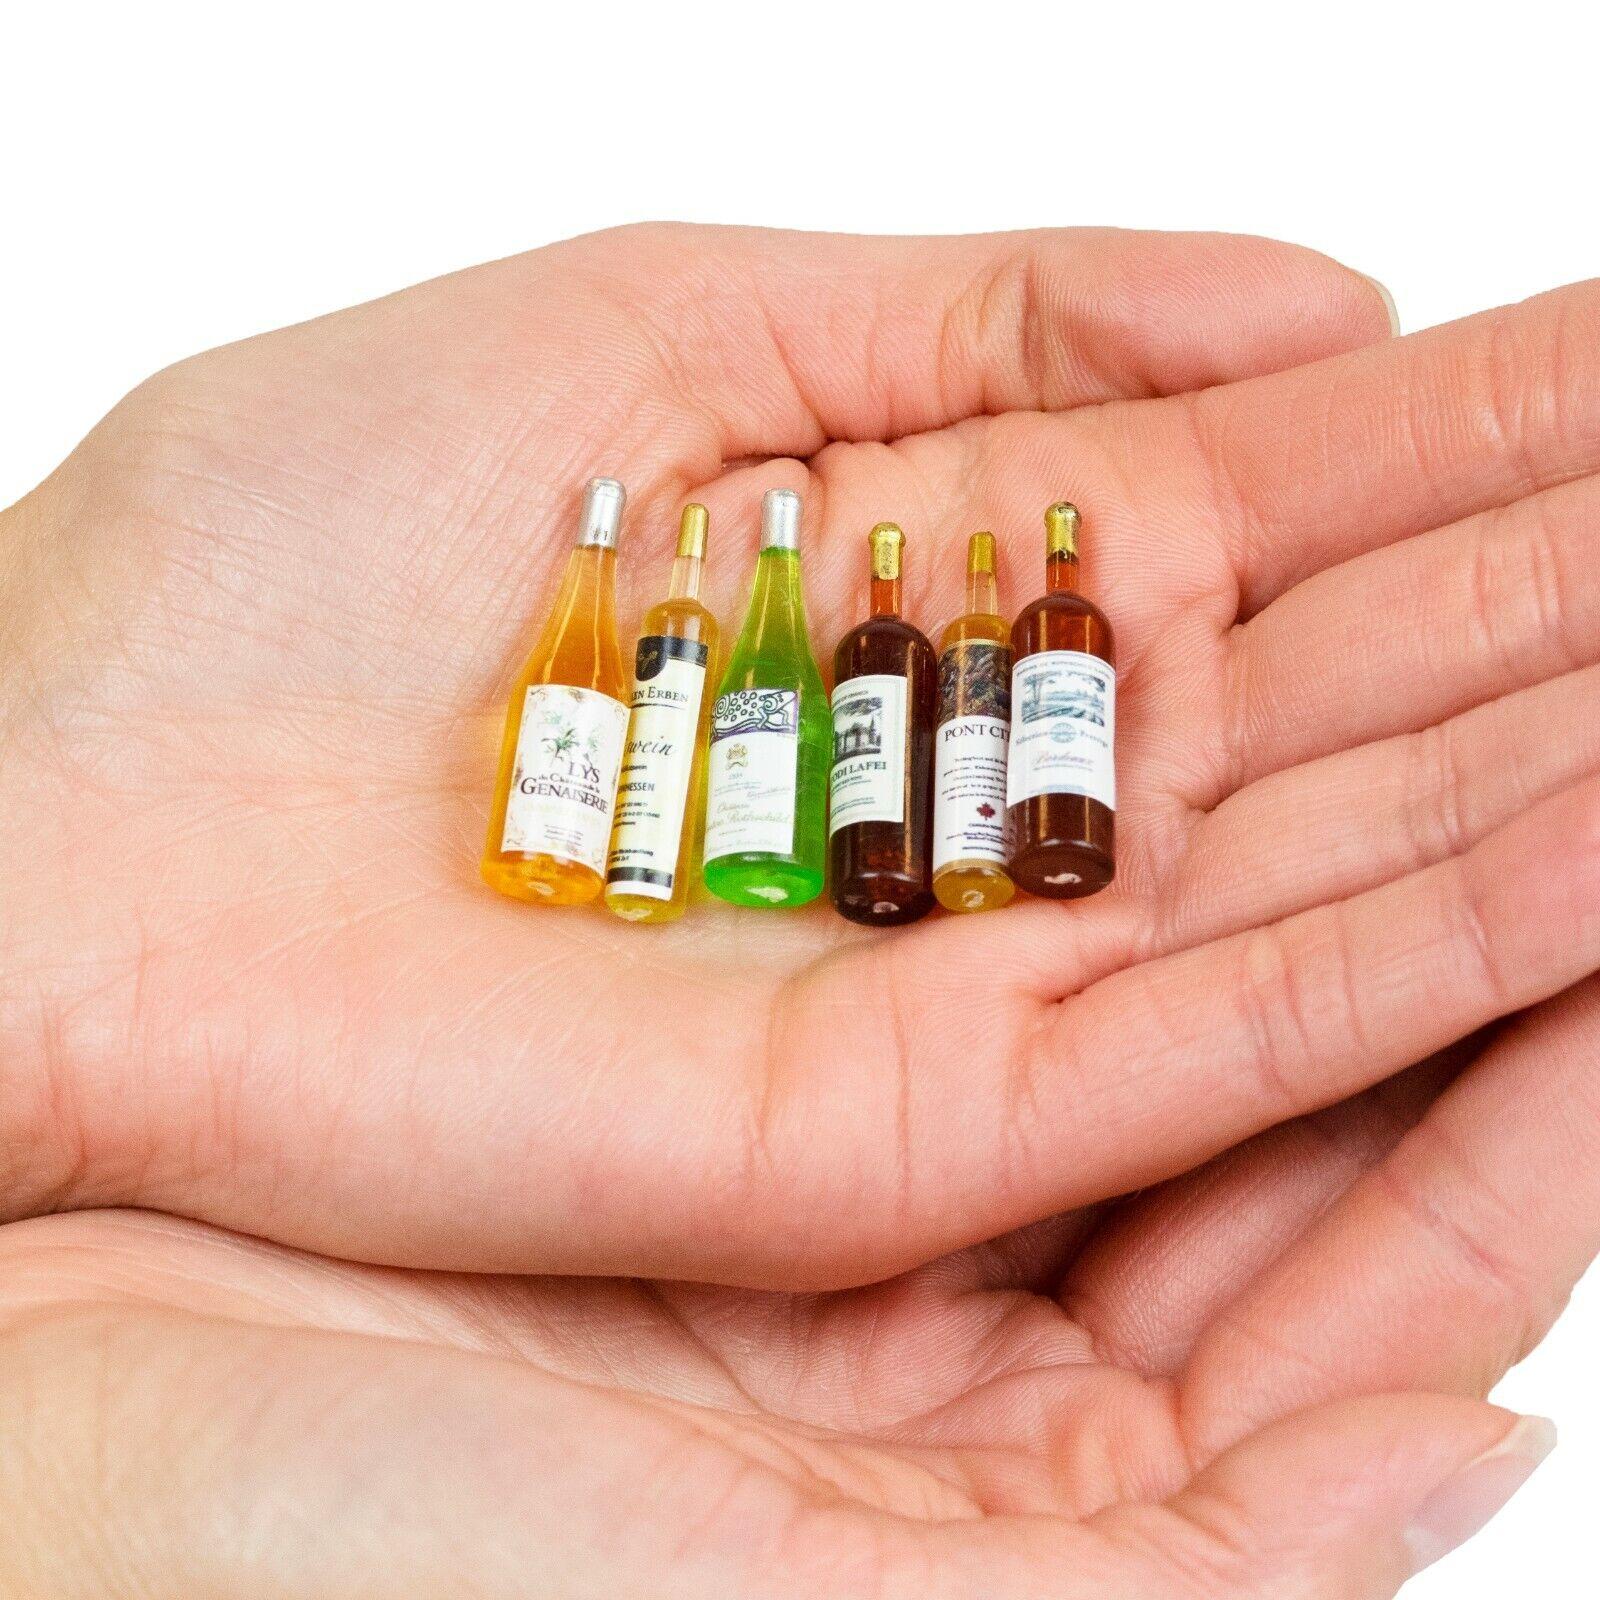 1//12th scale dolls house miniature Accessory Handmade Nail Polish Bottles